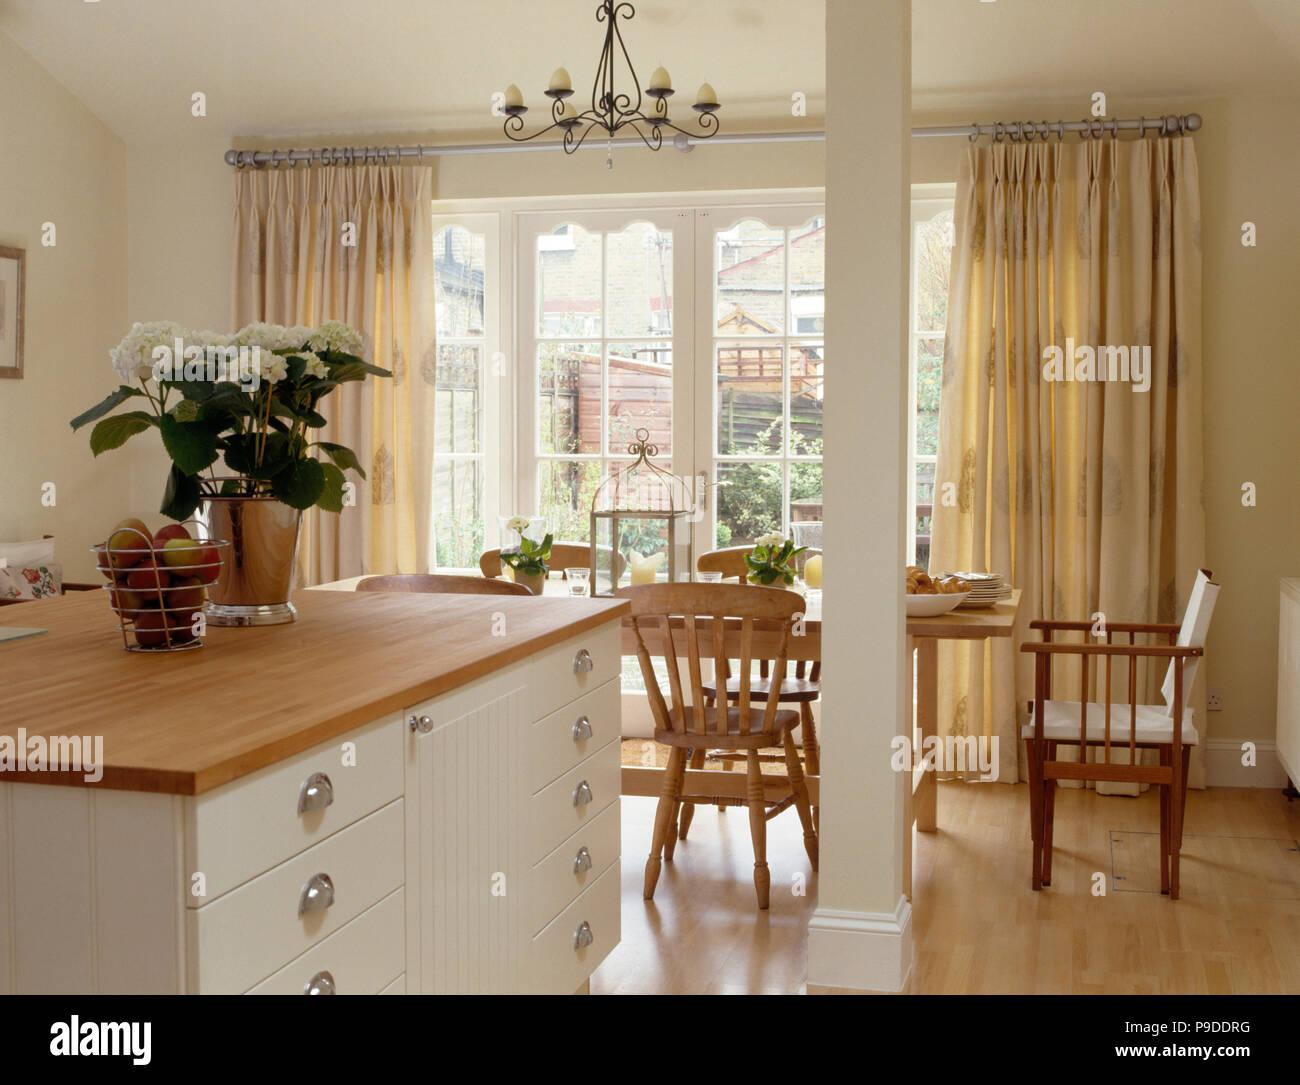 Unità di isola e dipinte RSJ in una townhouse cucina e sala ...